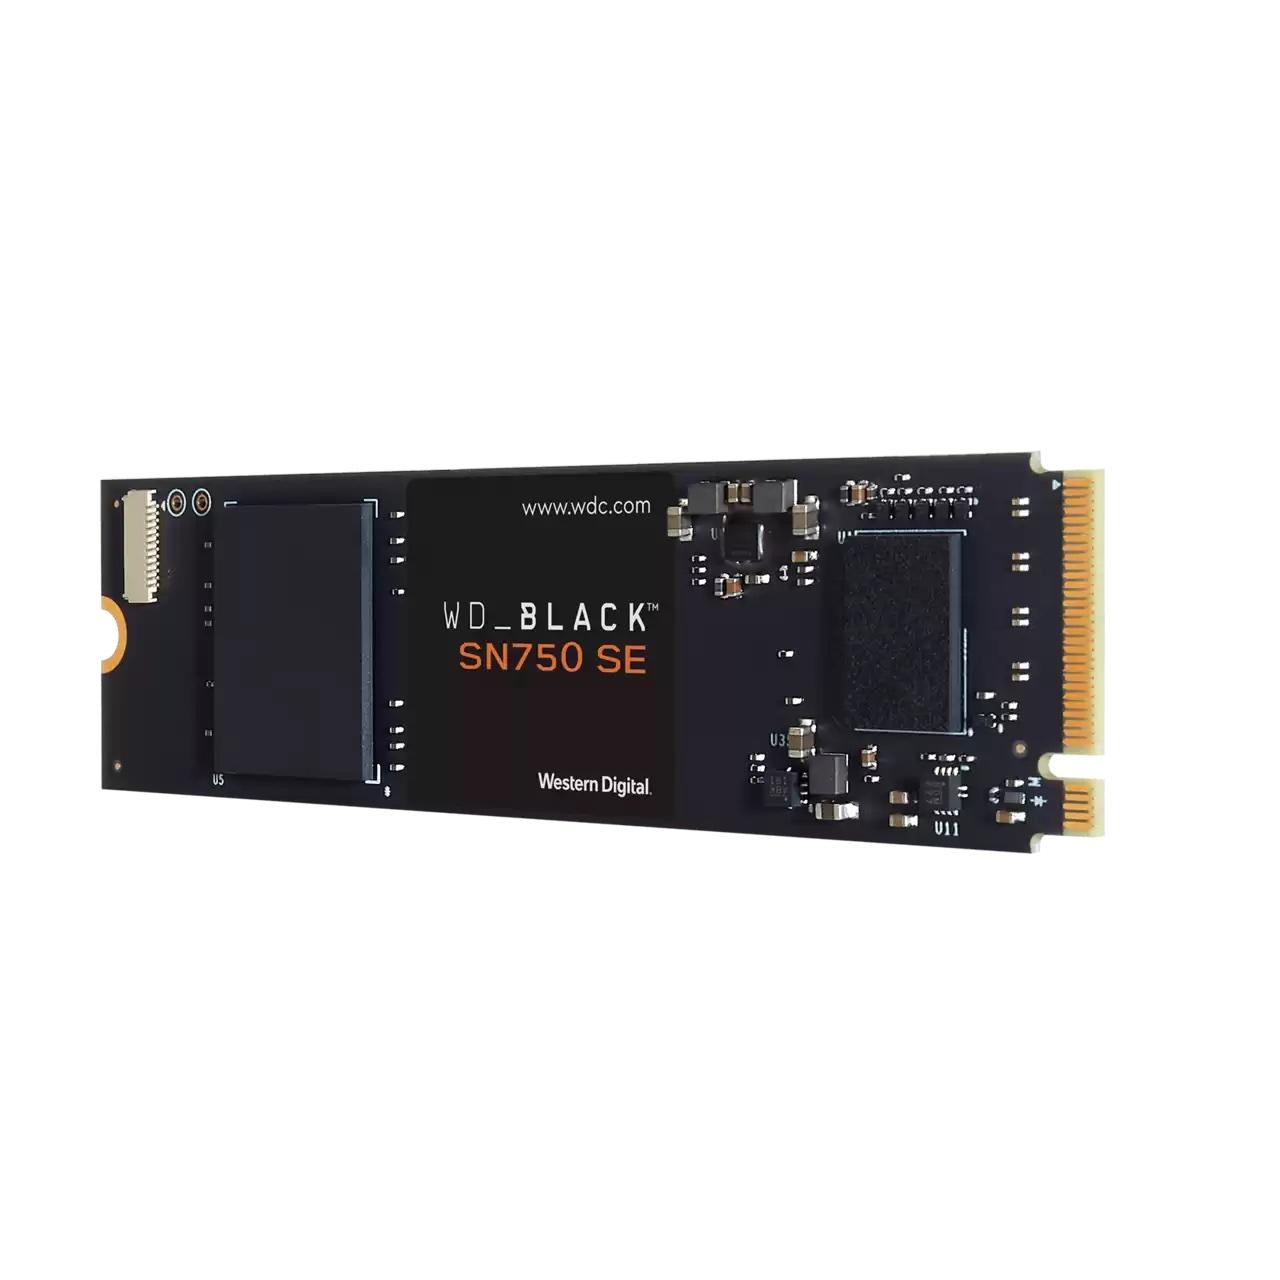 SSD 500GB WD_BLACK SN750 SE NVMe M.2 PCIe Gen4 - WDS500G1B0E